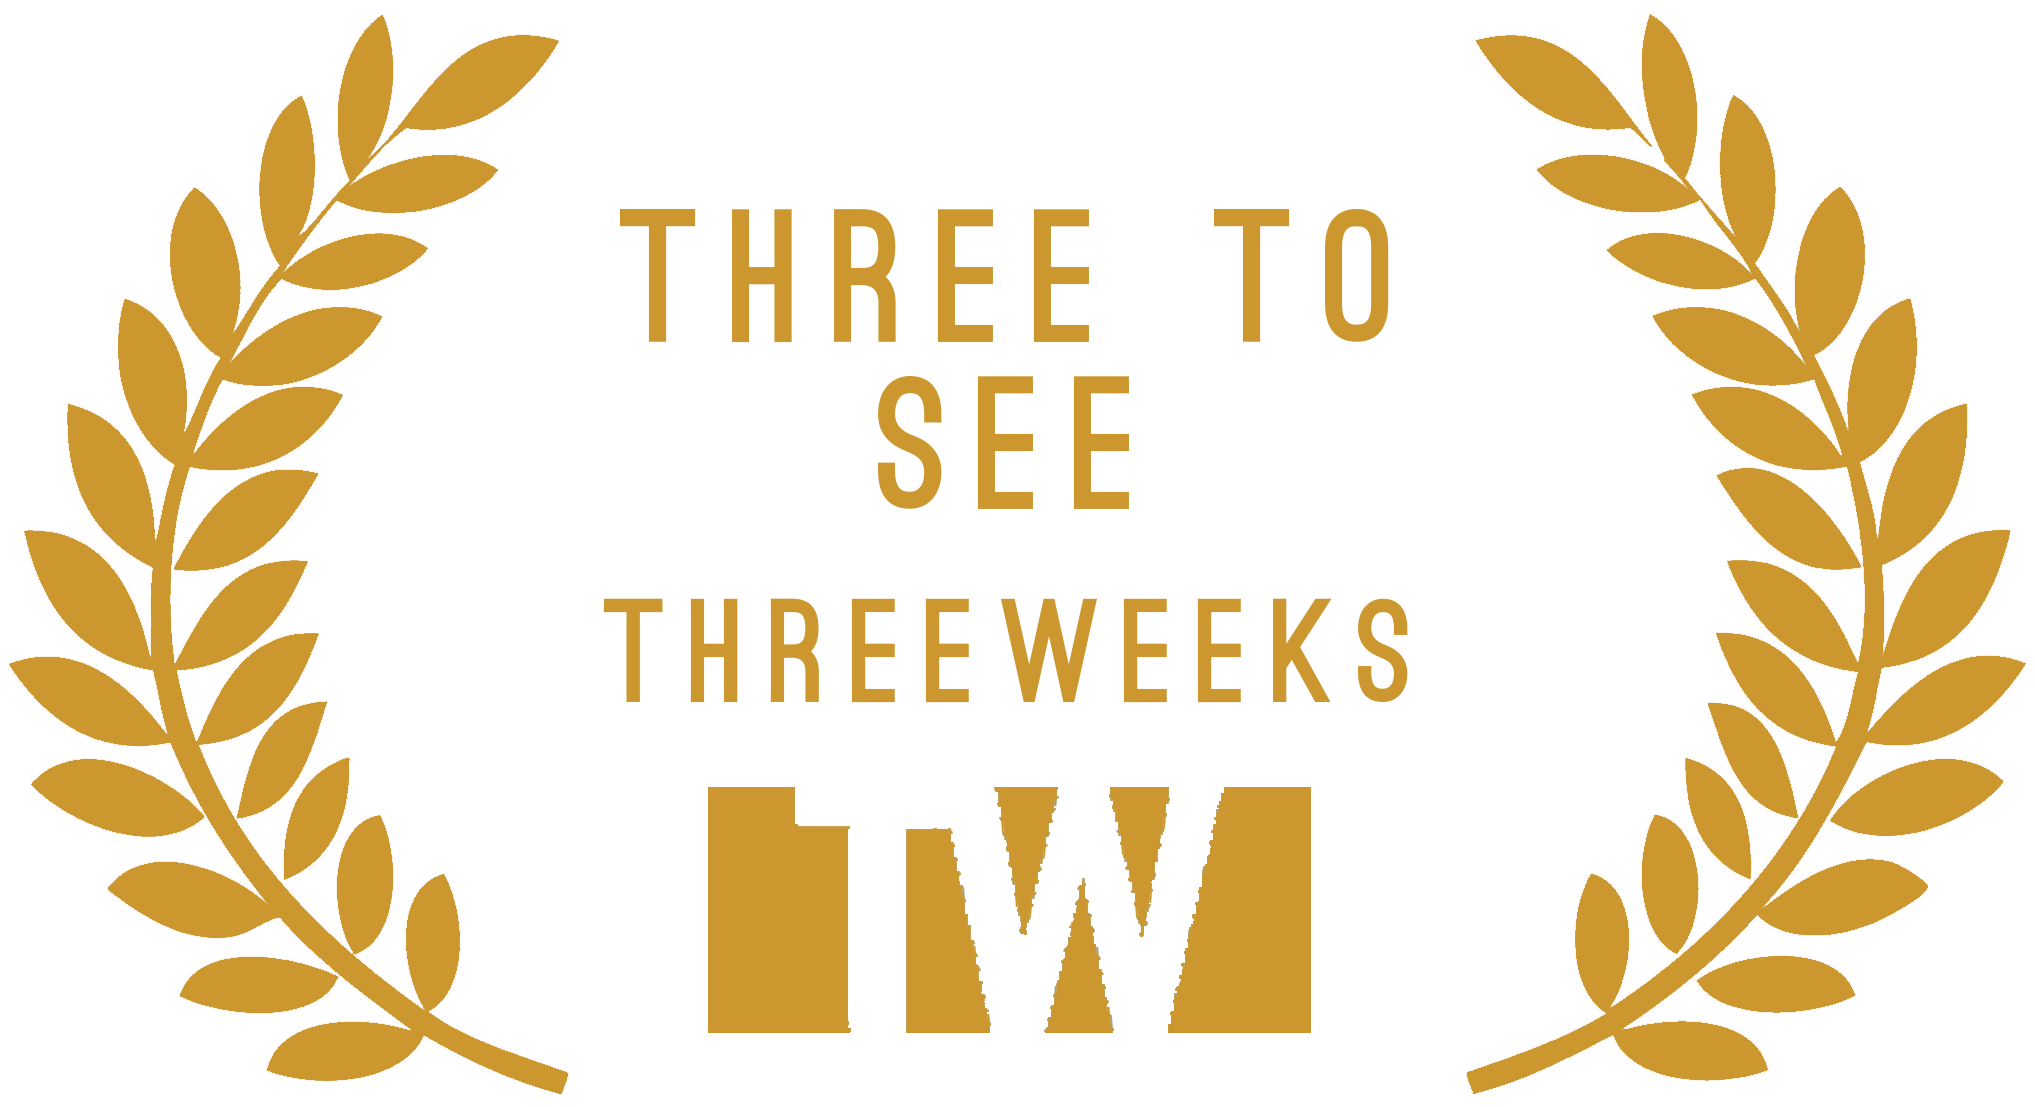 Three to see threeweeks award for Manchester Magician Aaron Calvert